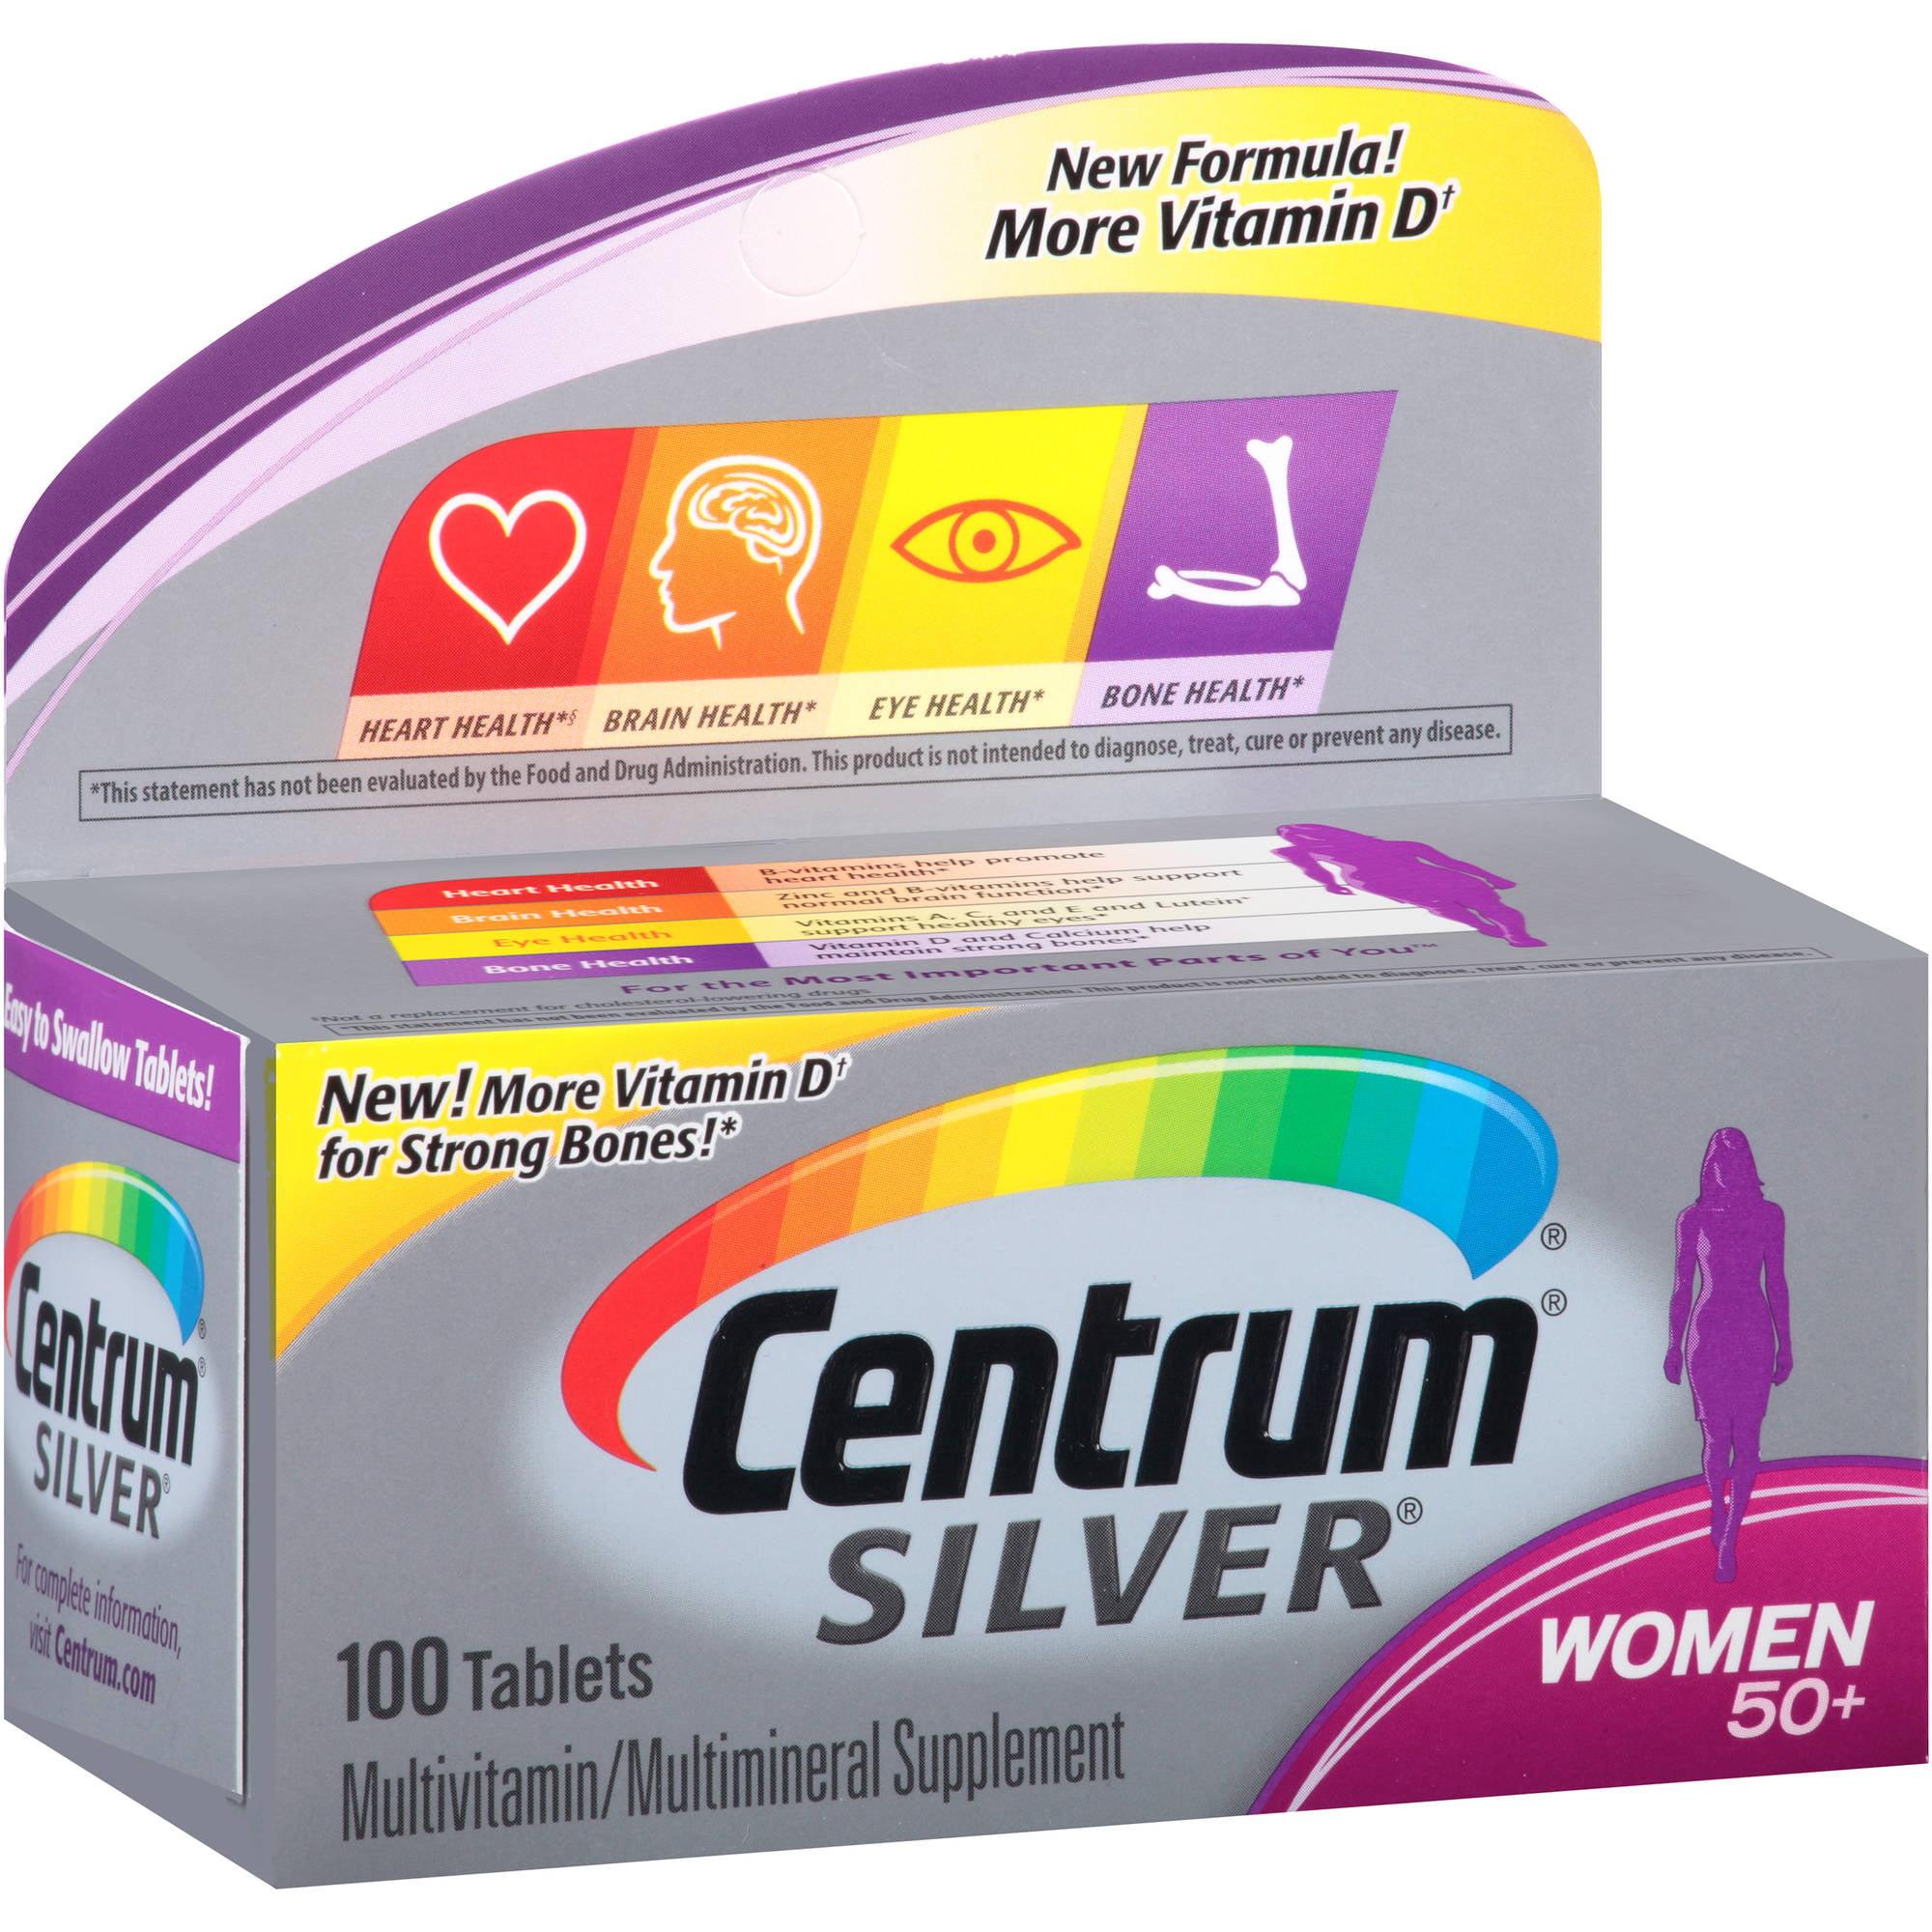 Centrum Silver Women 50+ Multivitamin / Multimineral Supplement Tablets, 100 count